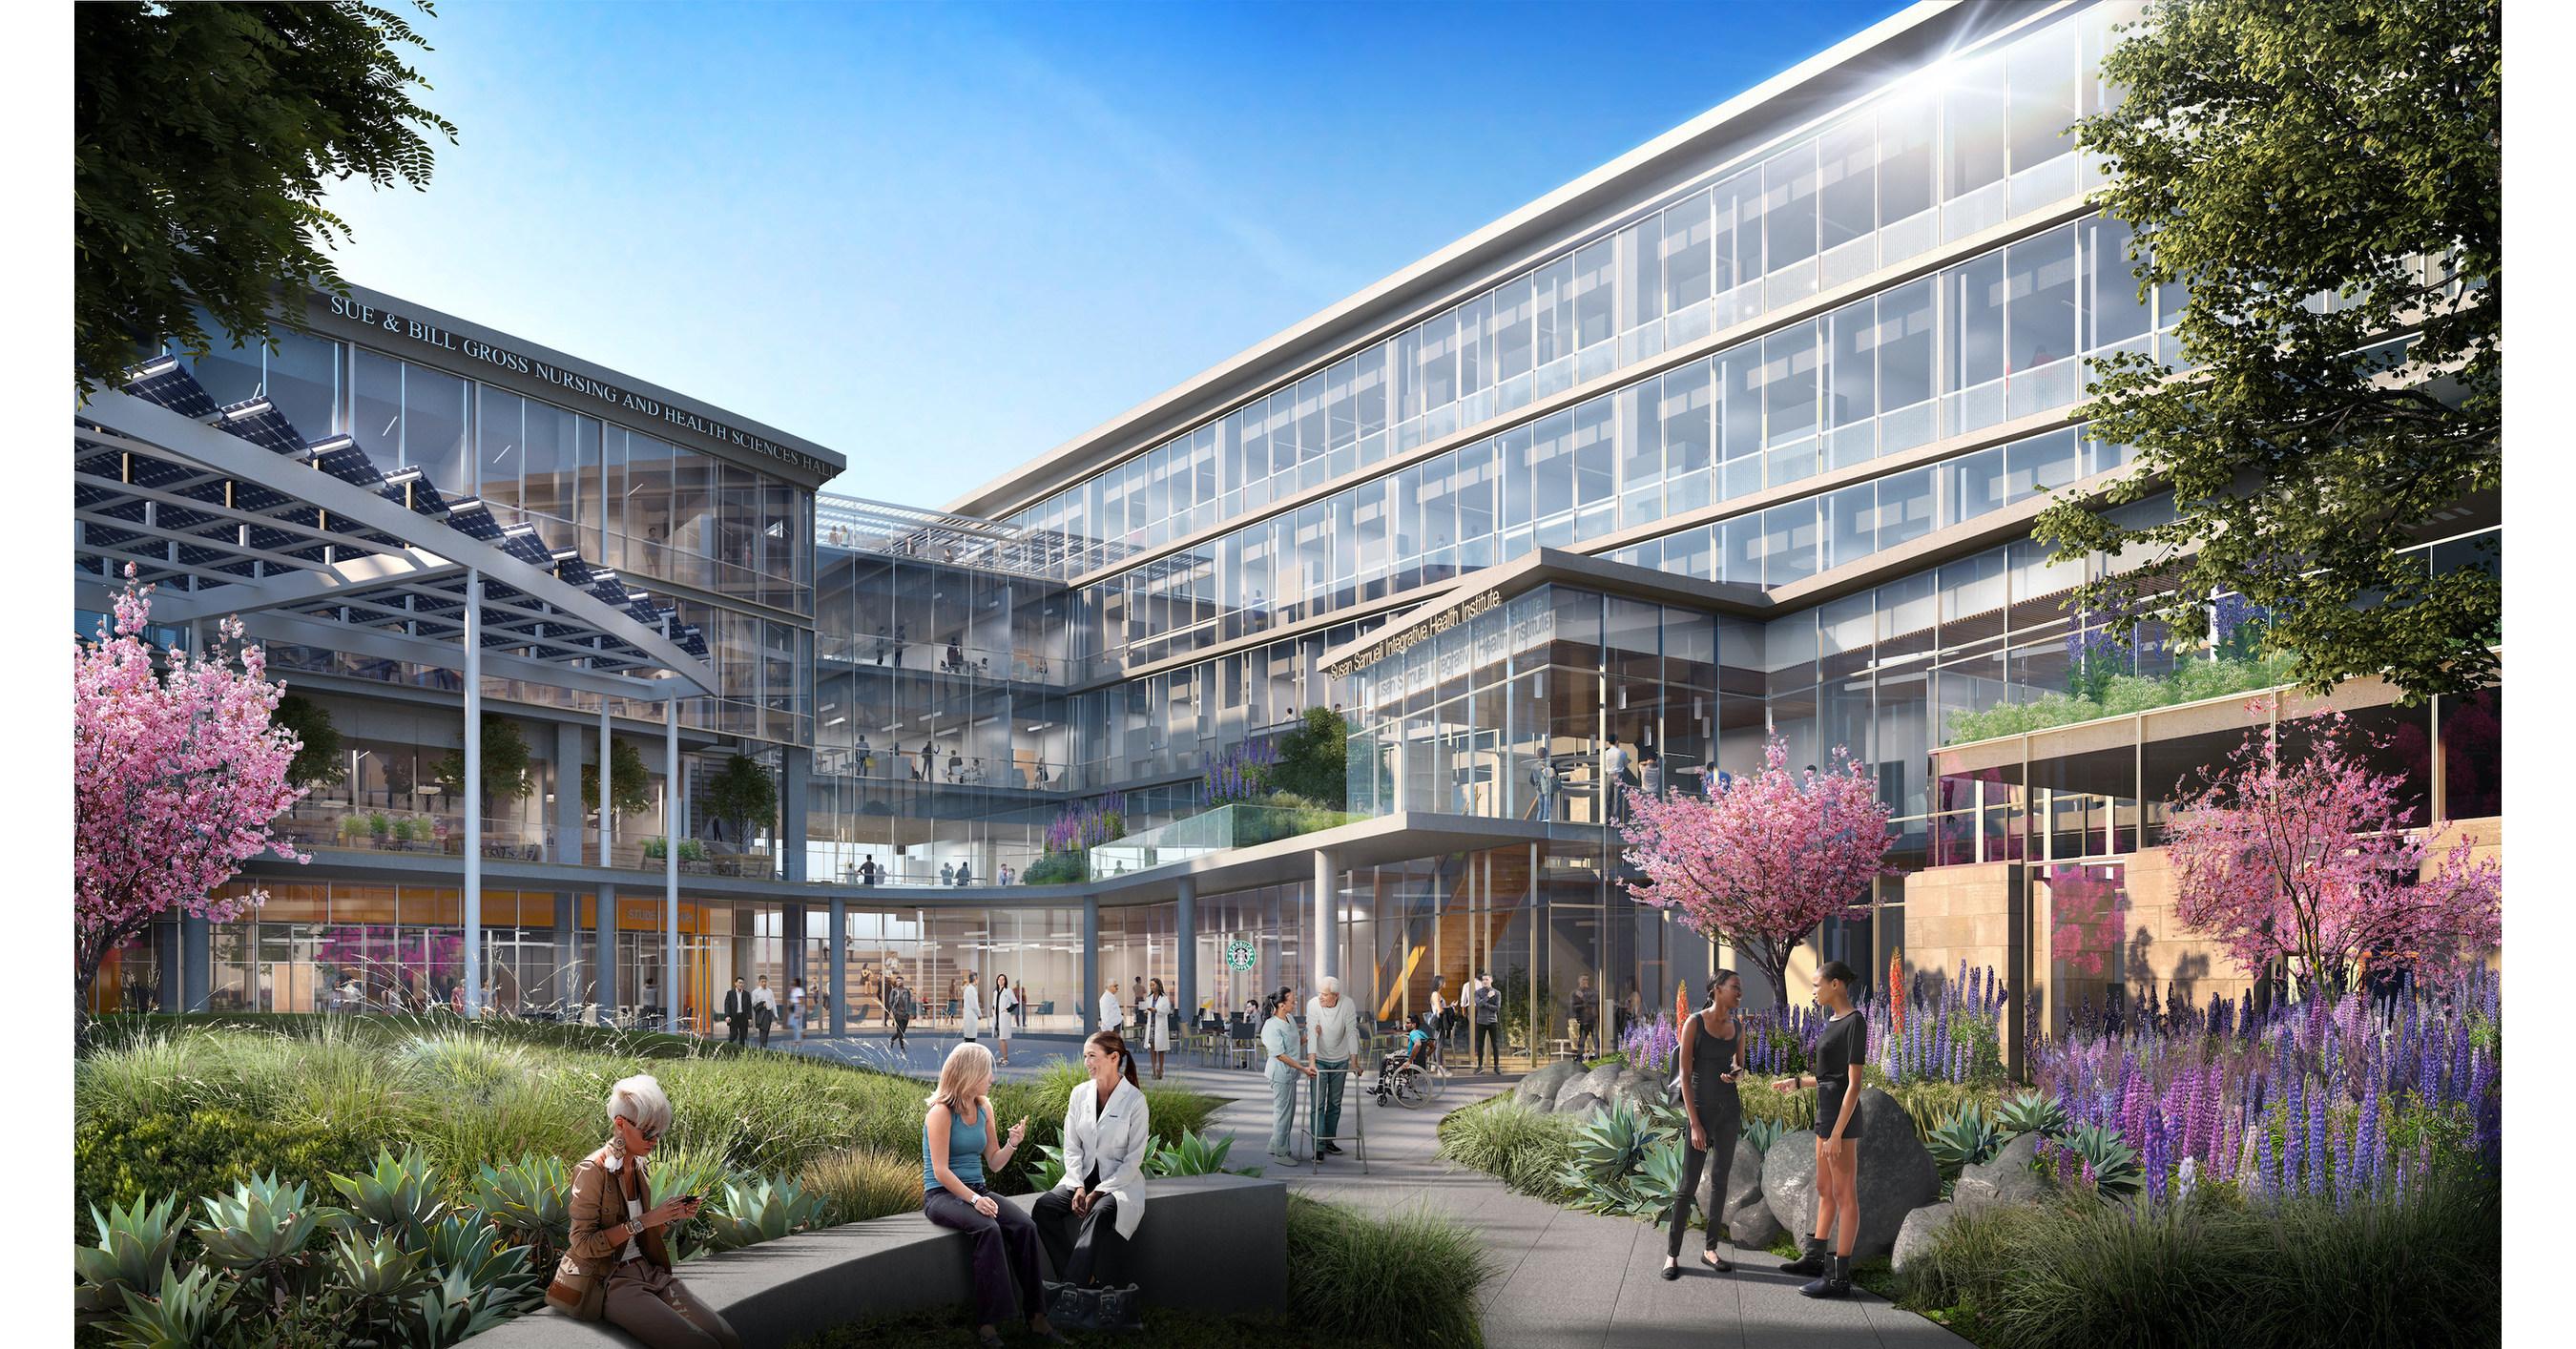 Construction Begins On Uc Irvine S New